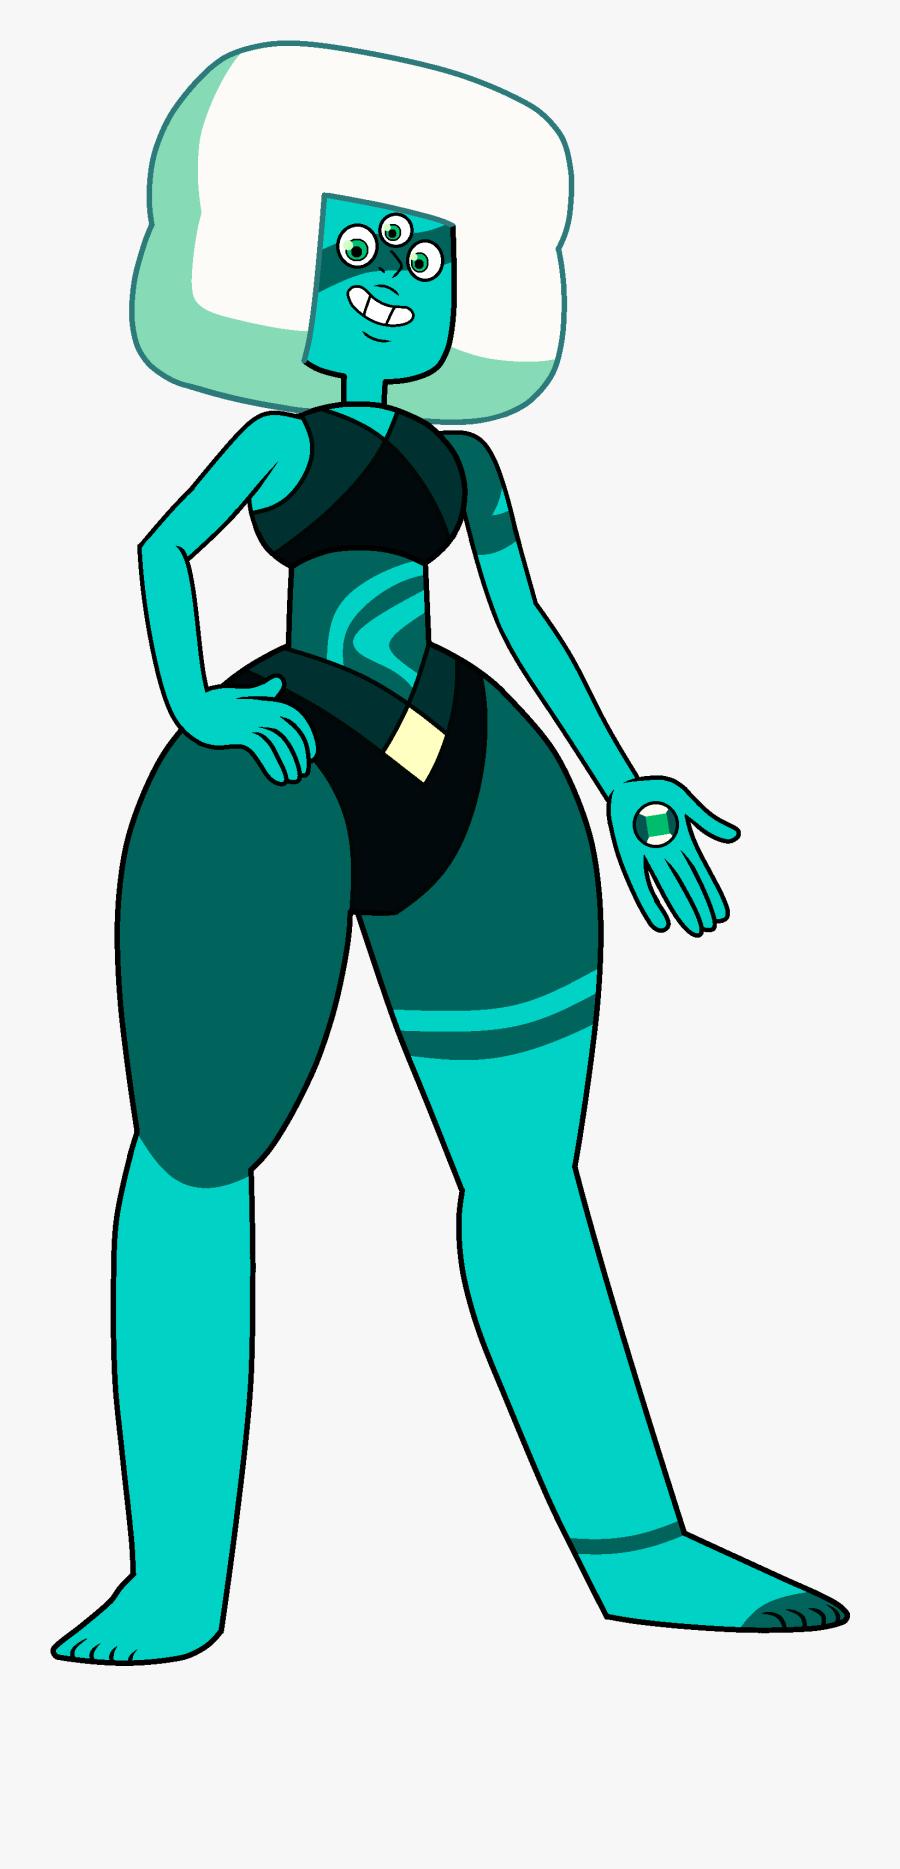 Image Garnet Malachite Png - Steven Universe Malachite Garnet, Transparent Clipart